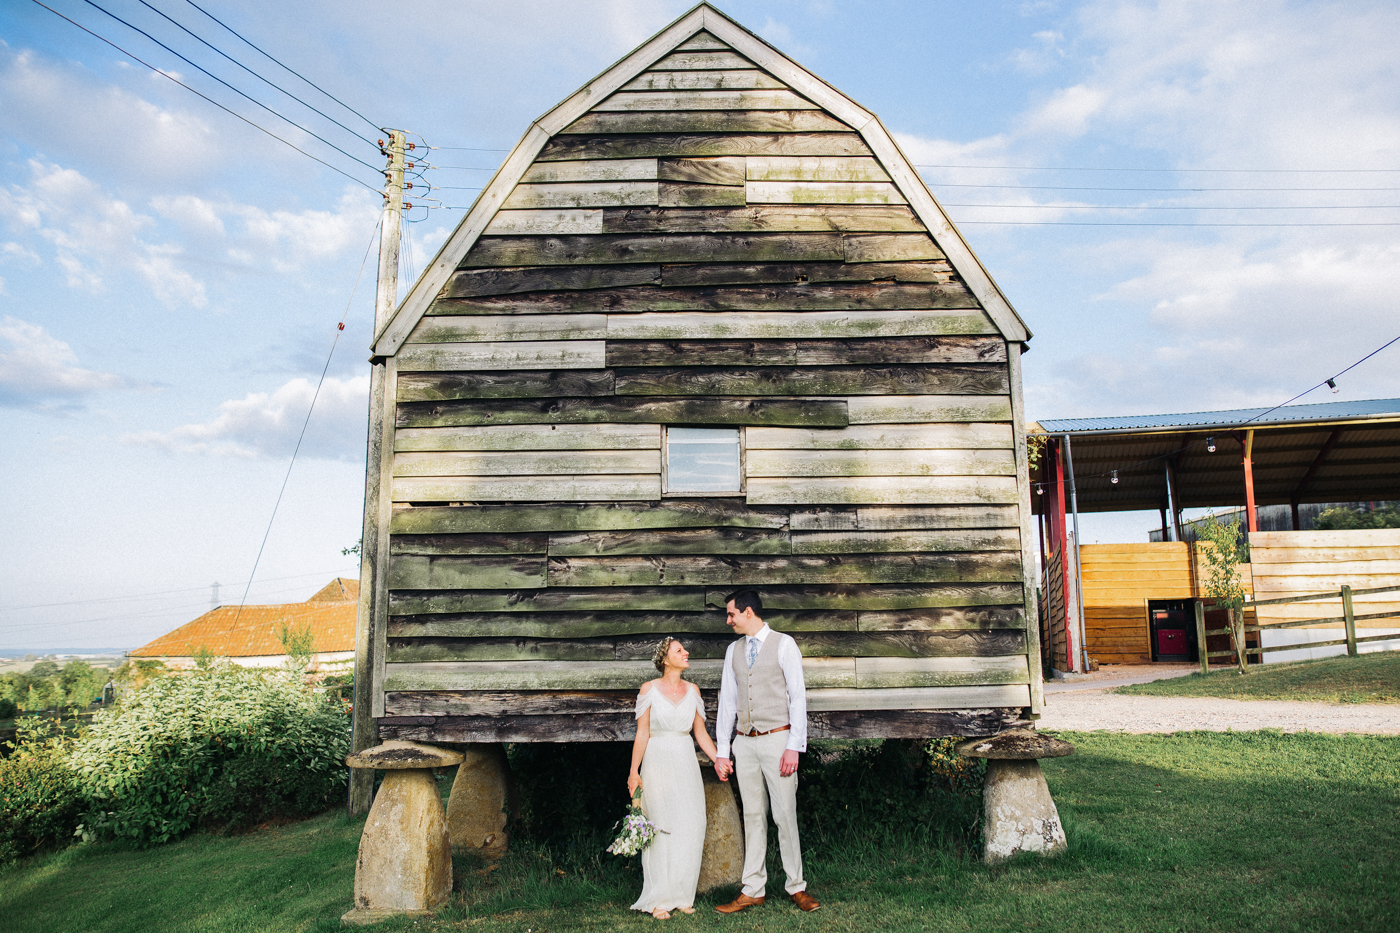 teesside-wedding-photographer-creative-marquee-outdoor-wedding-0005.jpg